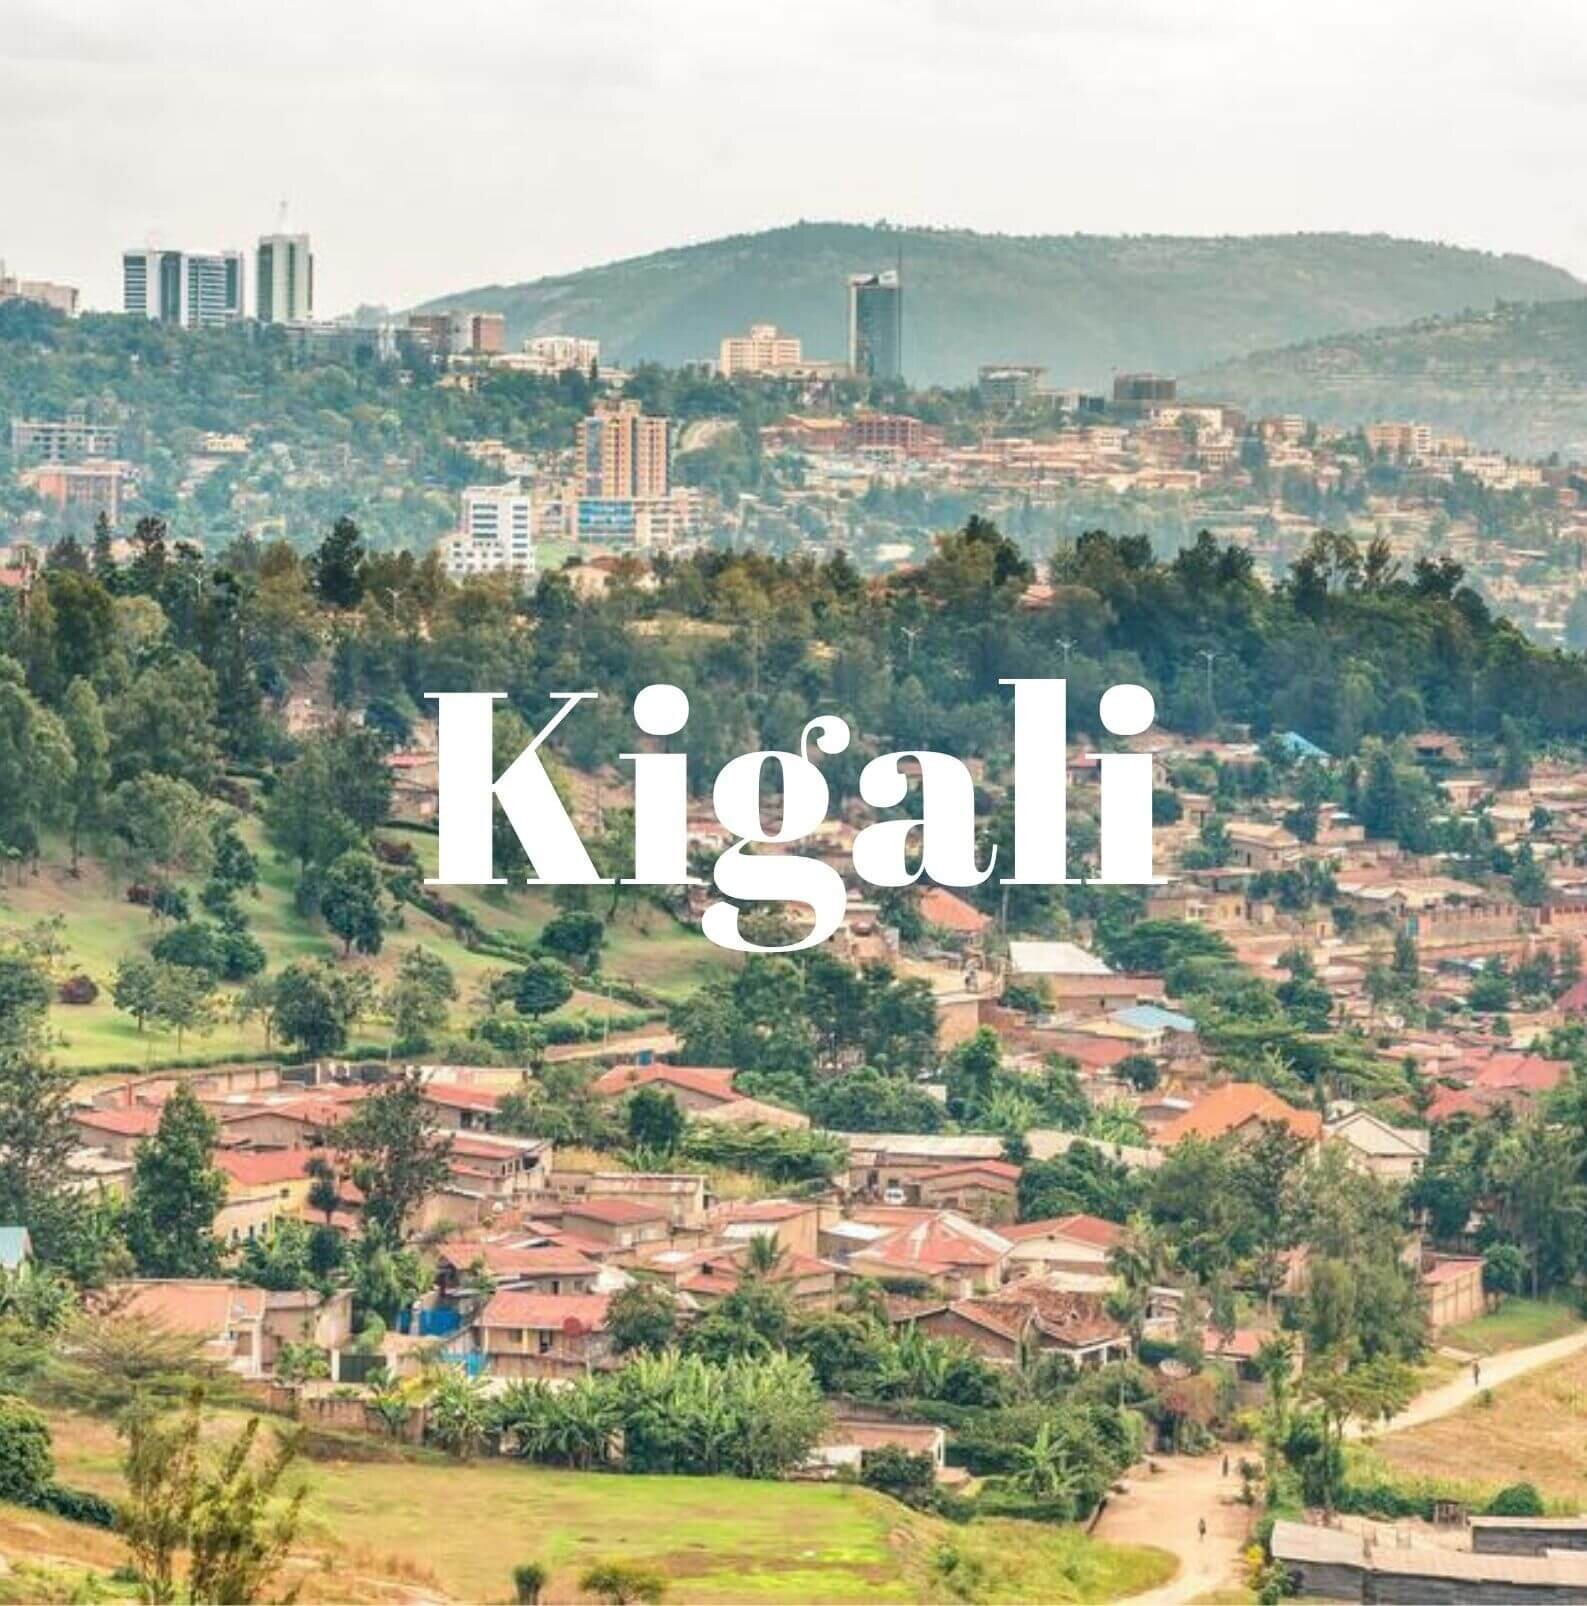 27 THINGS TO DO IN KIGALI, RWANDA